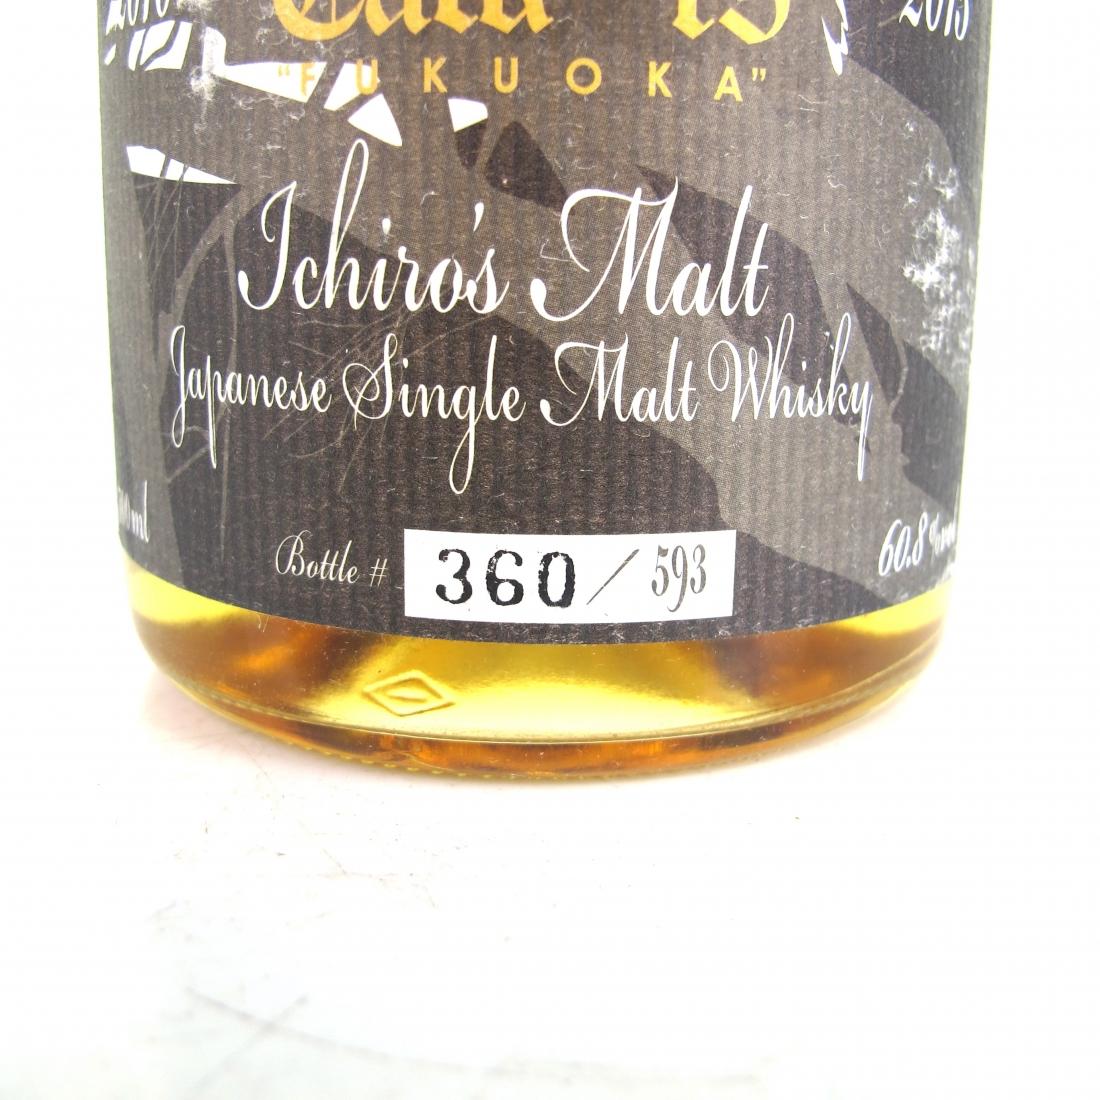 Chichibu 2010 Ichiro's Malt / Whisky Talk 2015 Fukuoka